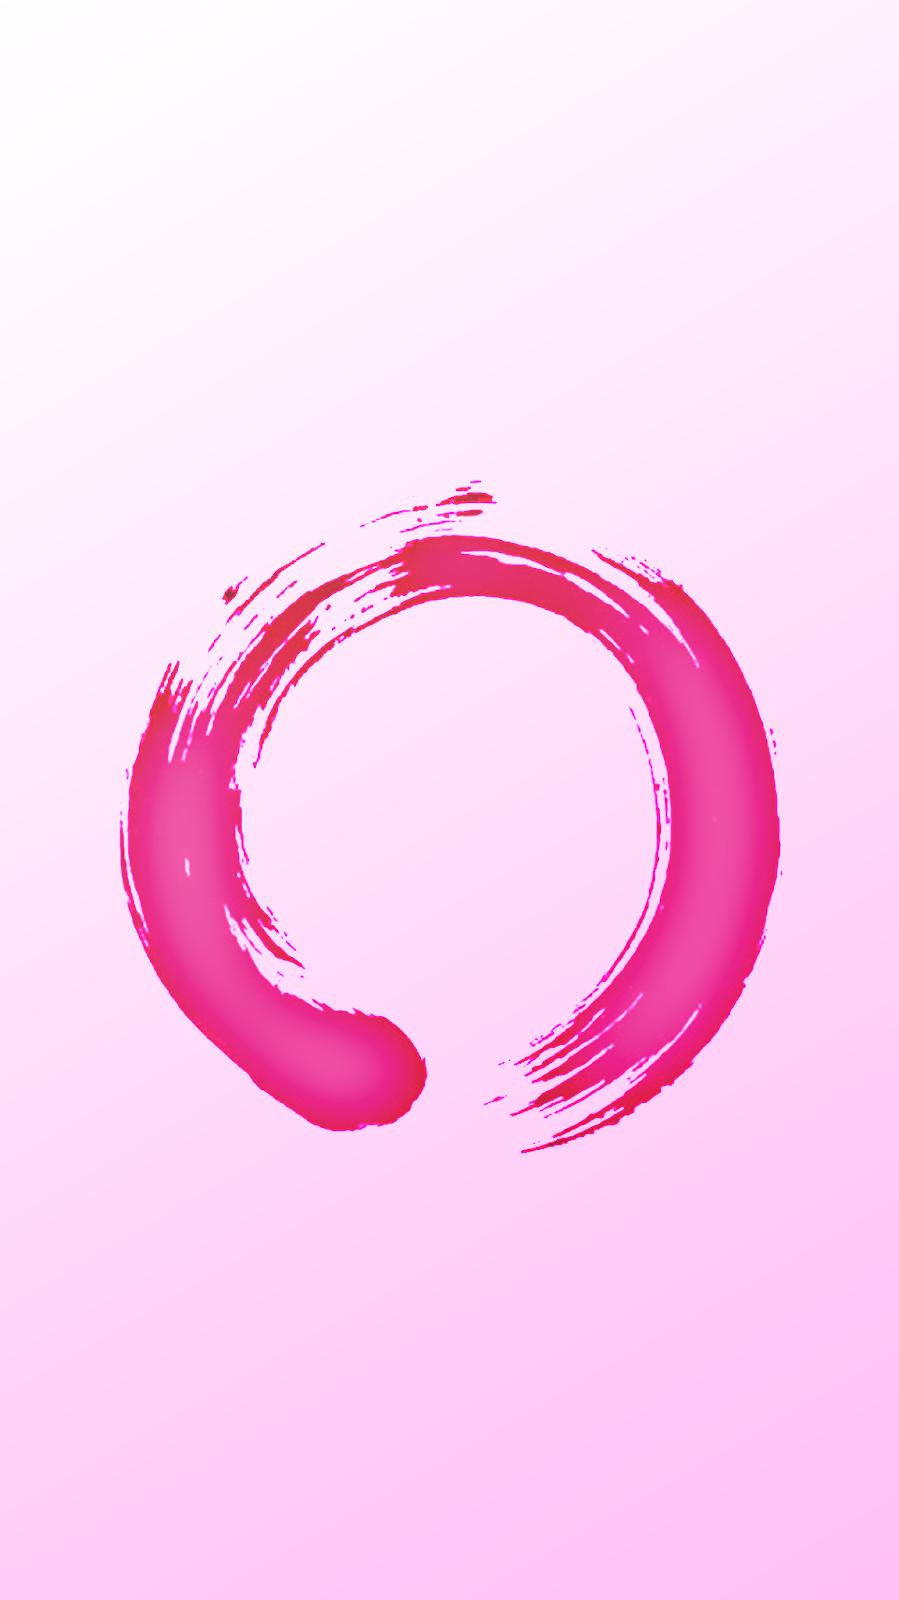 #aesthetic #pink #wallpaper